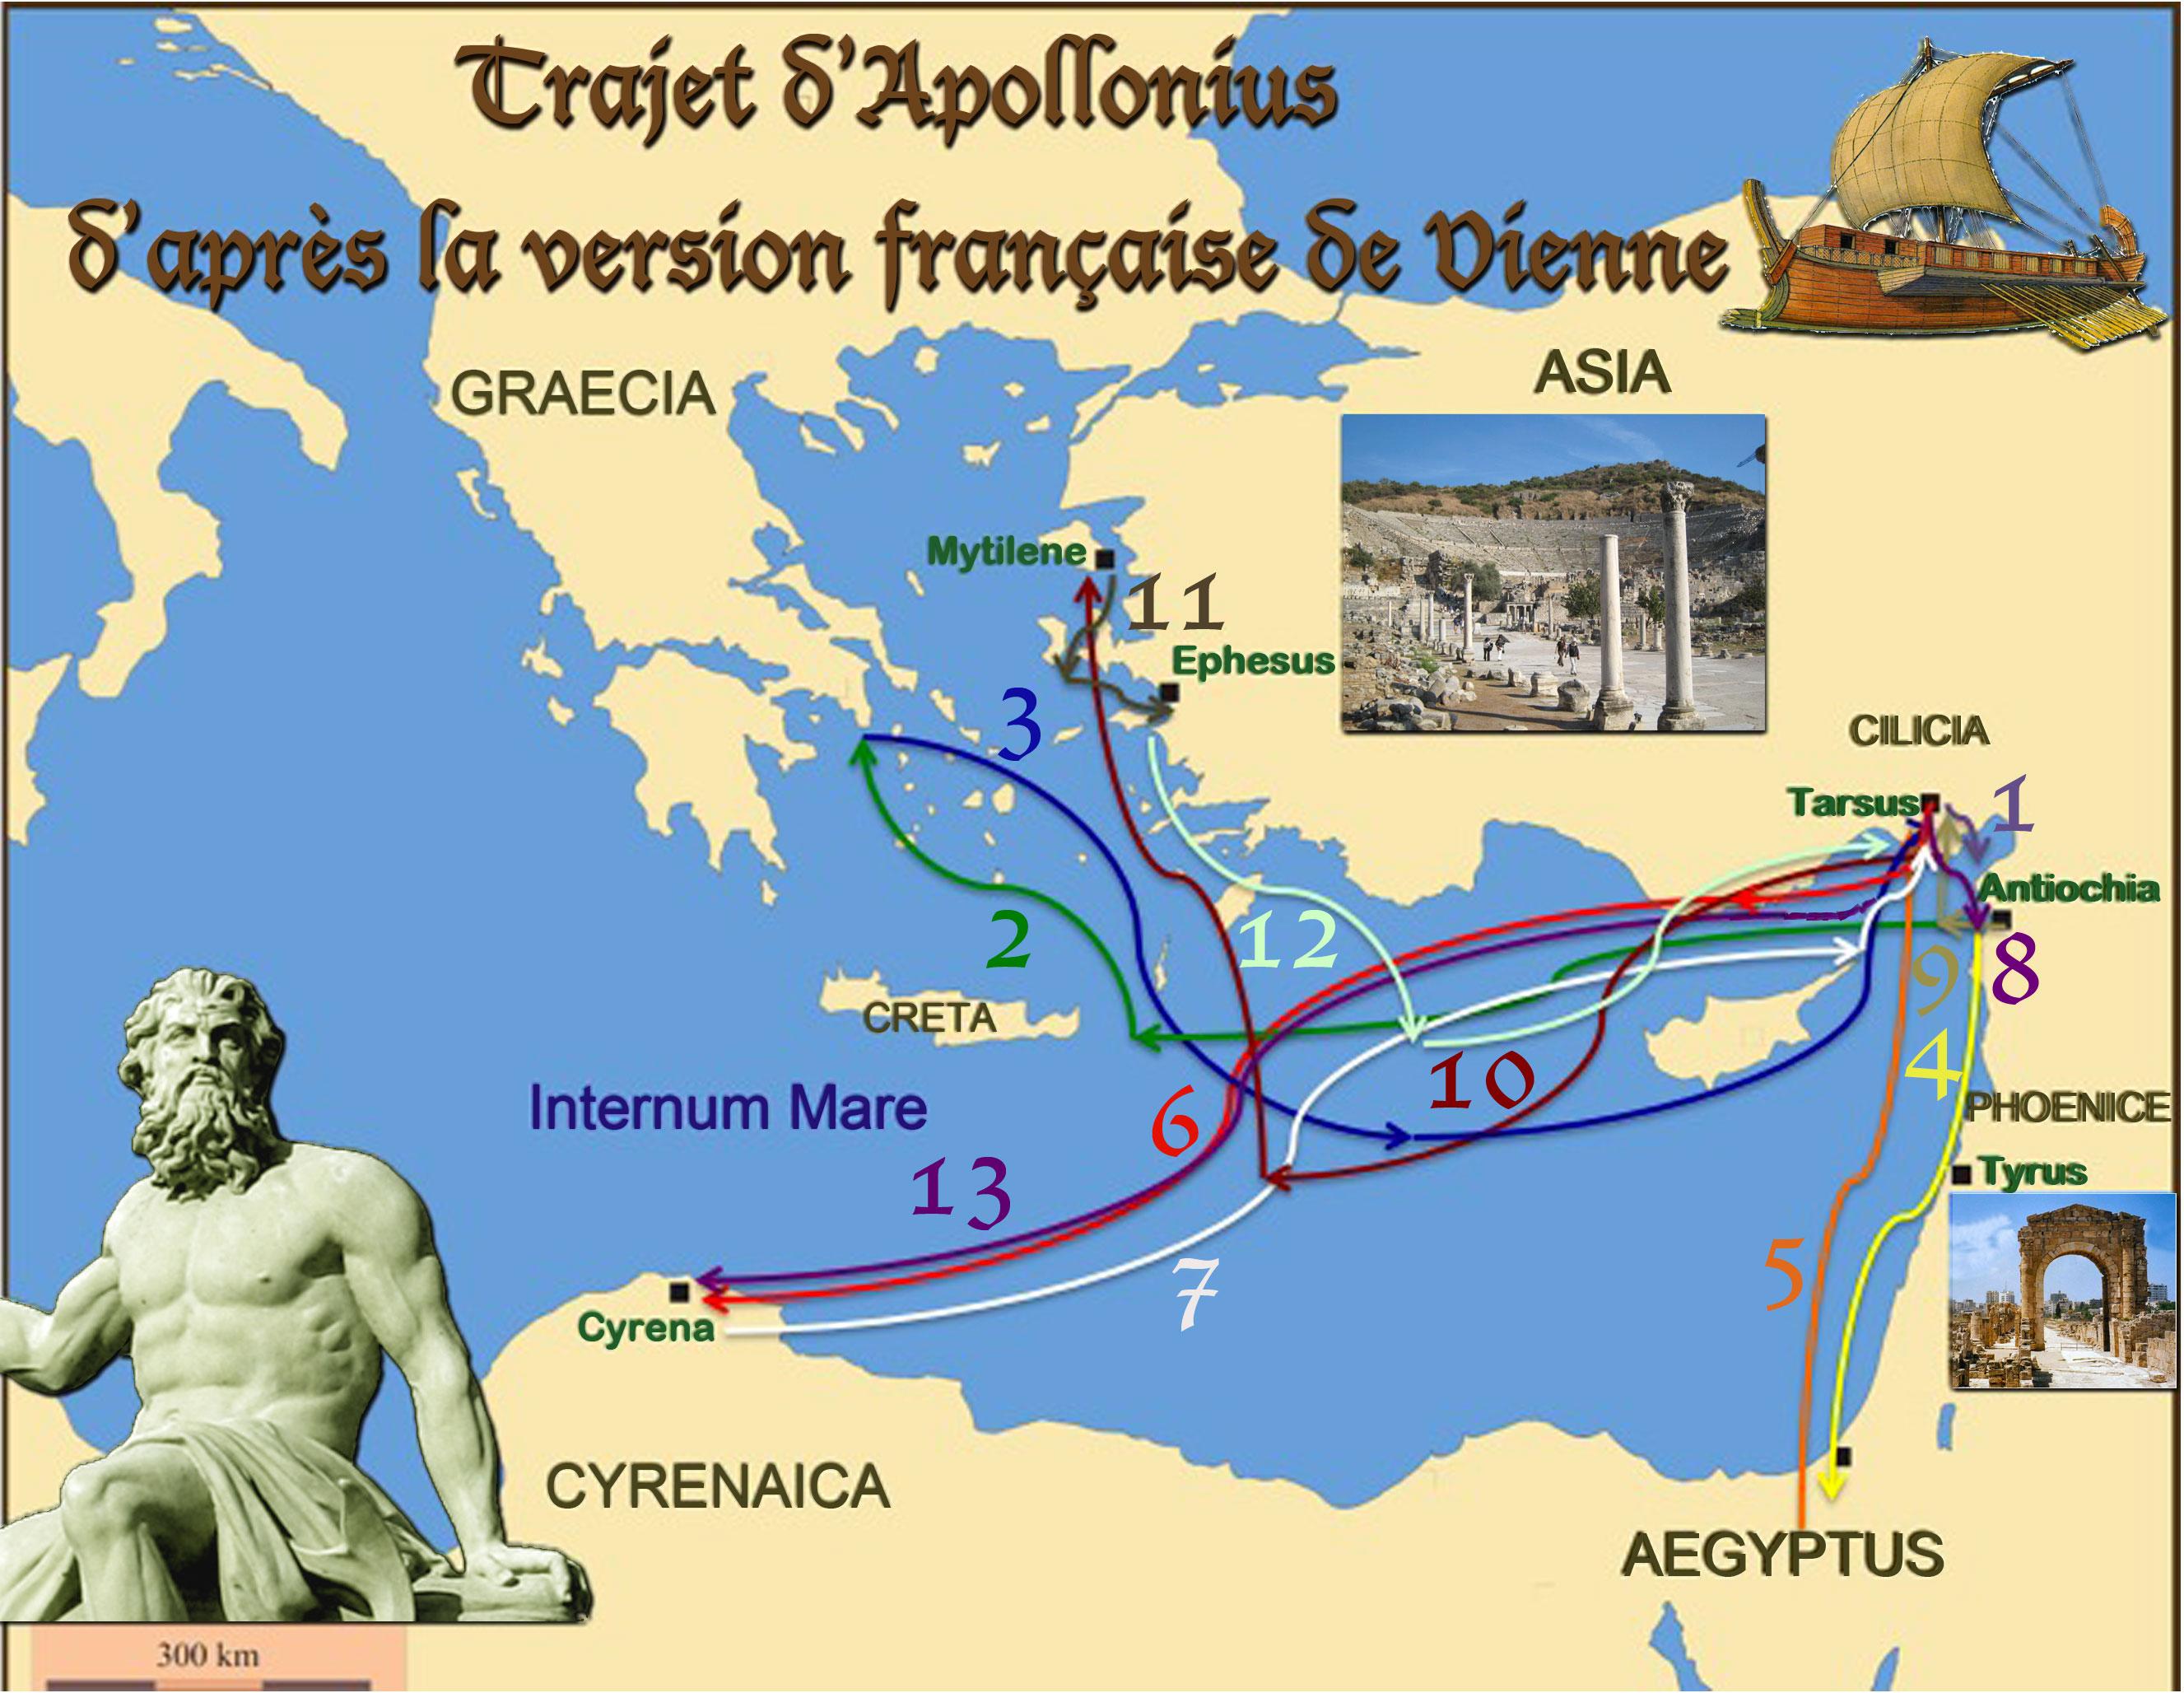 TrajetsApollonius02